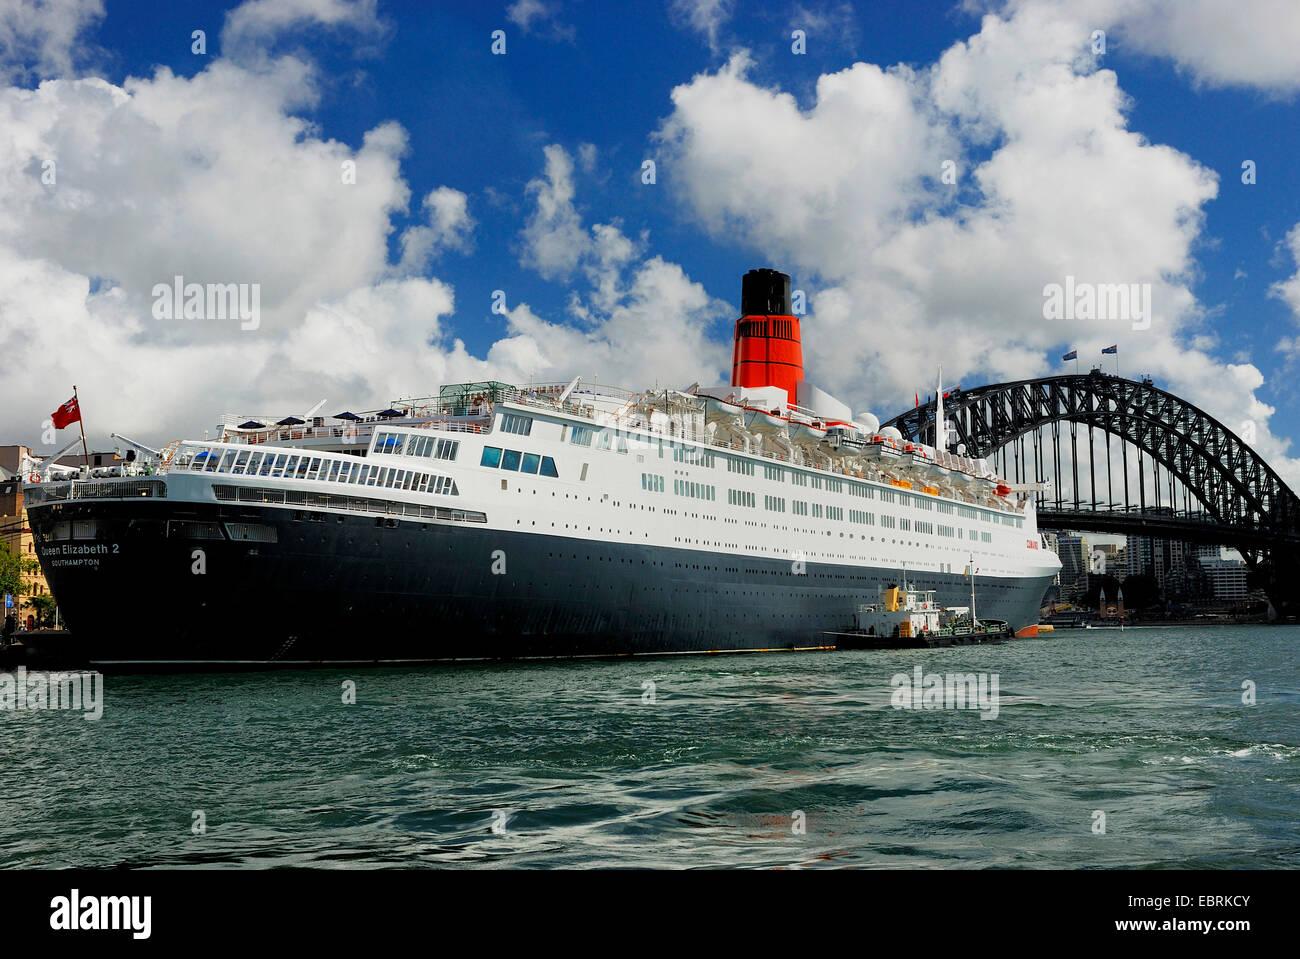 Queen Elizabeth 2 ocean liner in front of Harbour Bridge, Circular Quay, Sydney Cove, Australia, New South Wales, - Stock Image